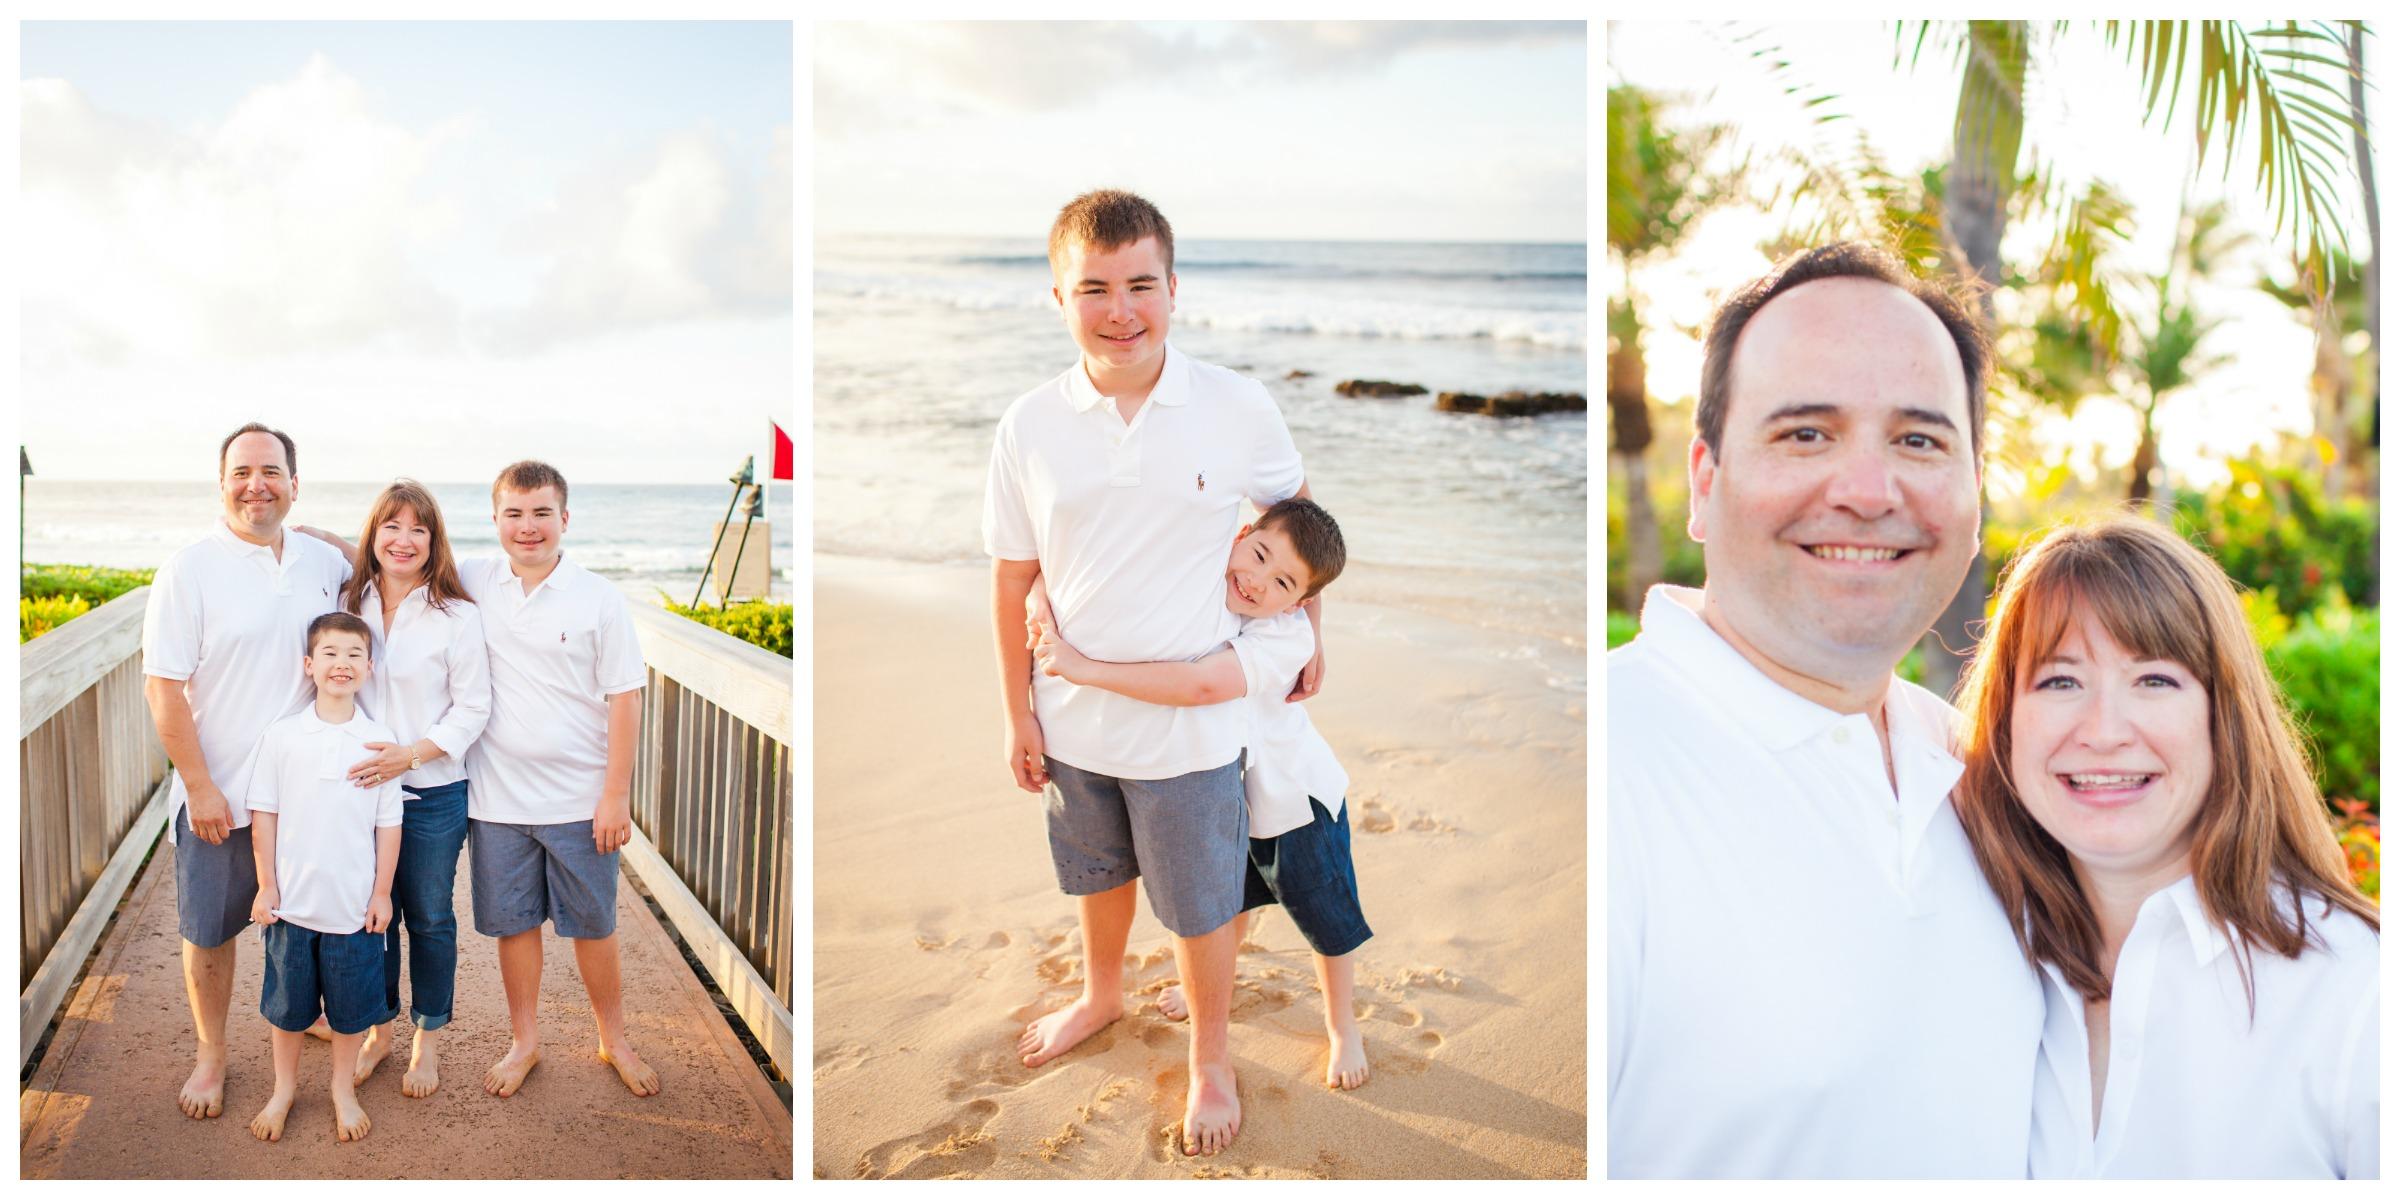 Pacific Dream Photography - Hawaii Photographer - Portrait Photographer - Family Photographer